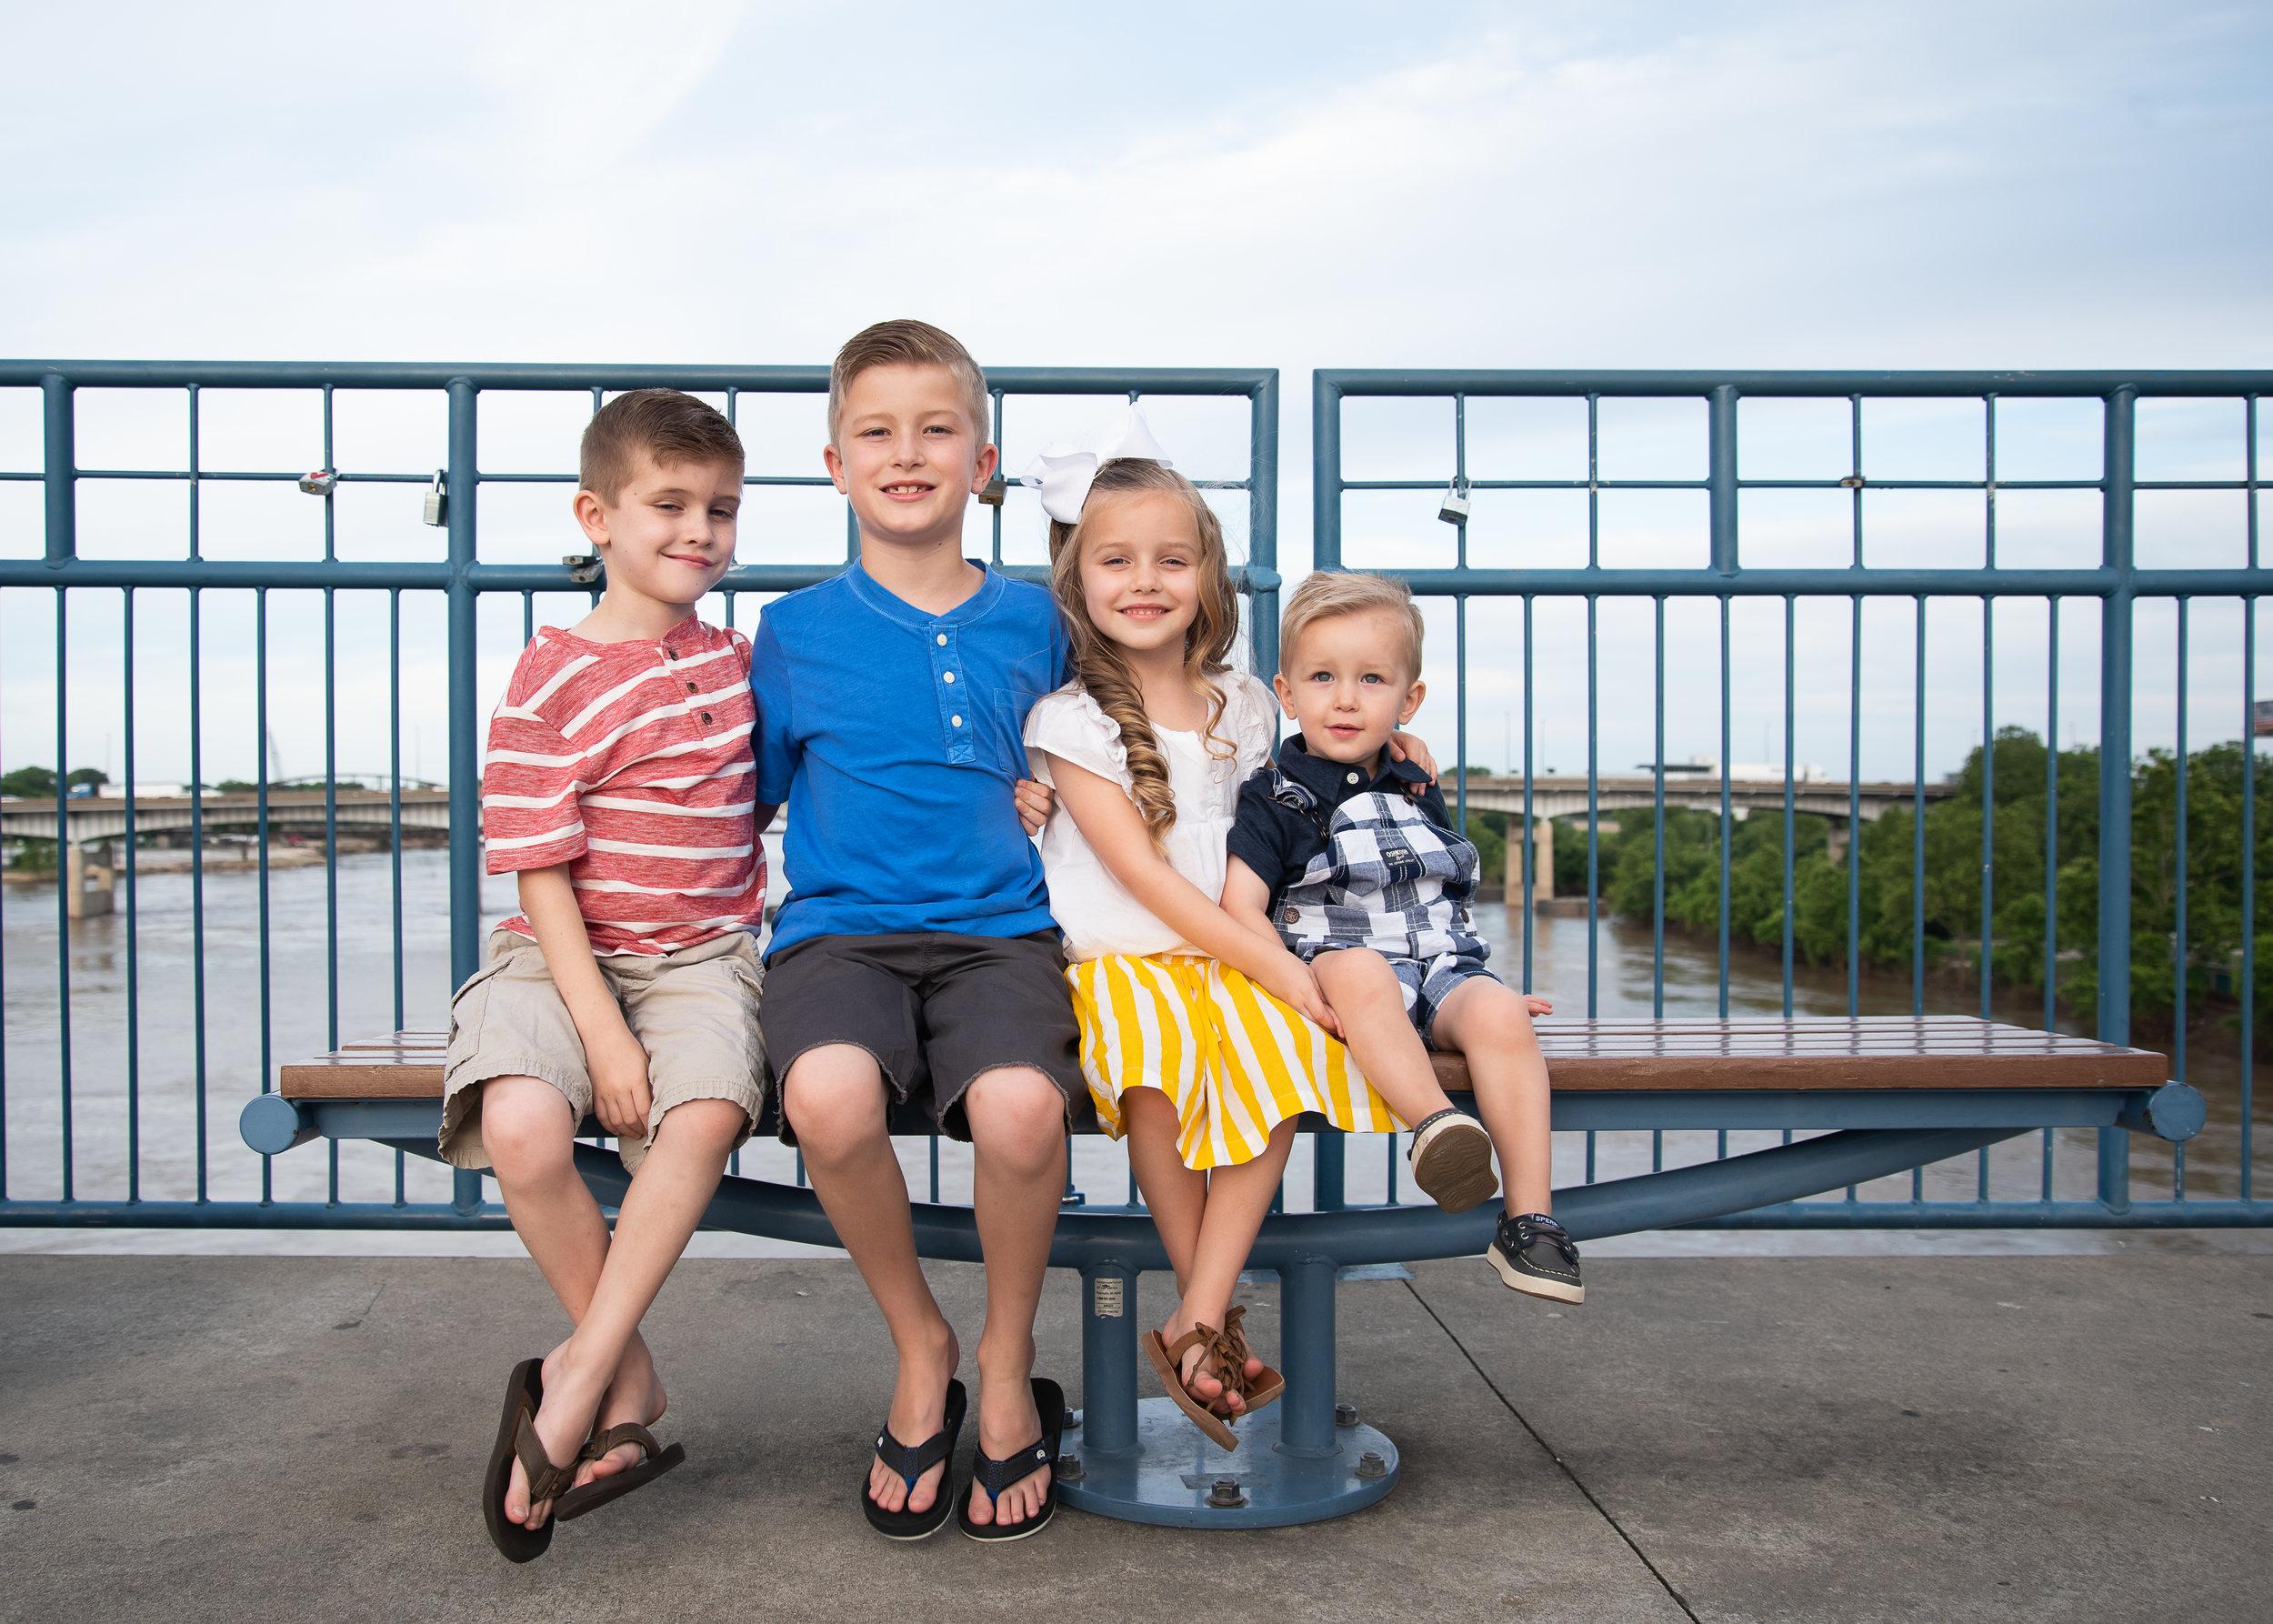 littlerockfamilyportraitphotographer.jpg